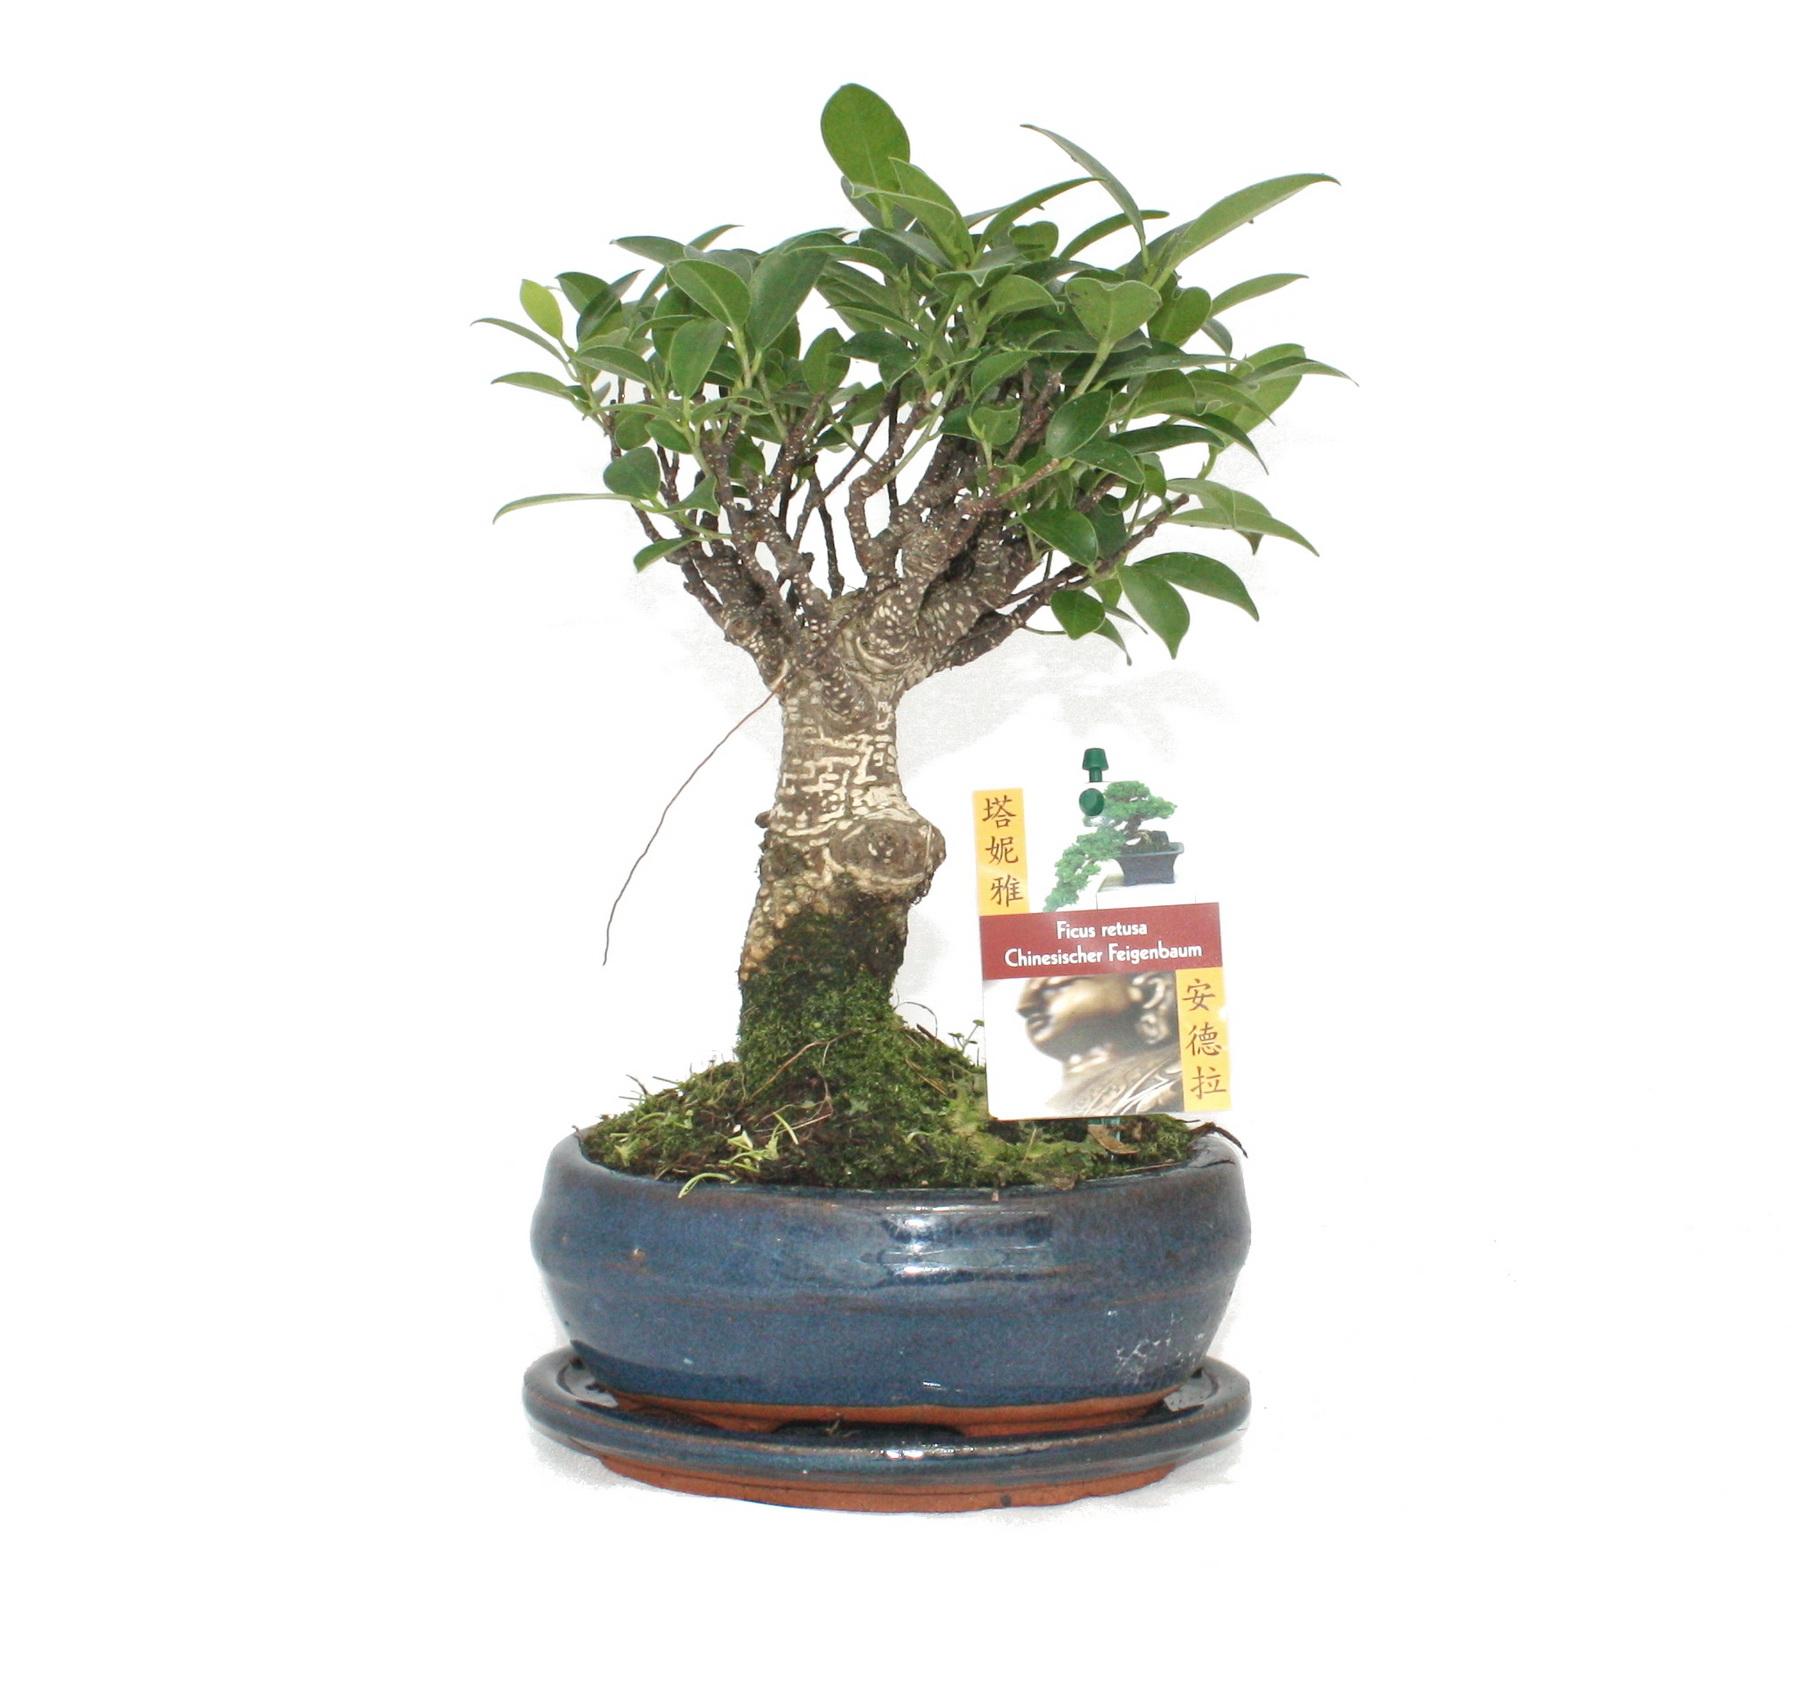 bonsai chinesischer feigenbaum ficus retusa ca 6 jahre kugelform. Black Bedroom Furniture Sets. Home Design Ideas